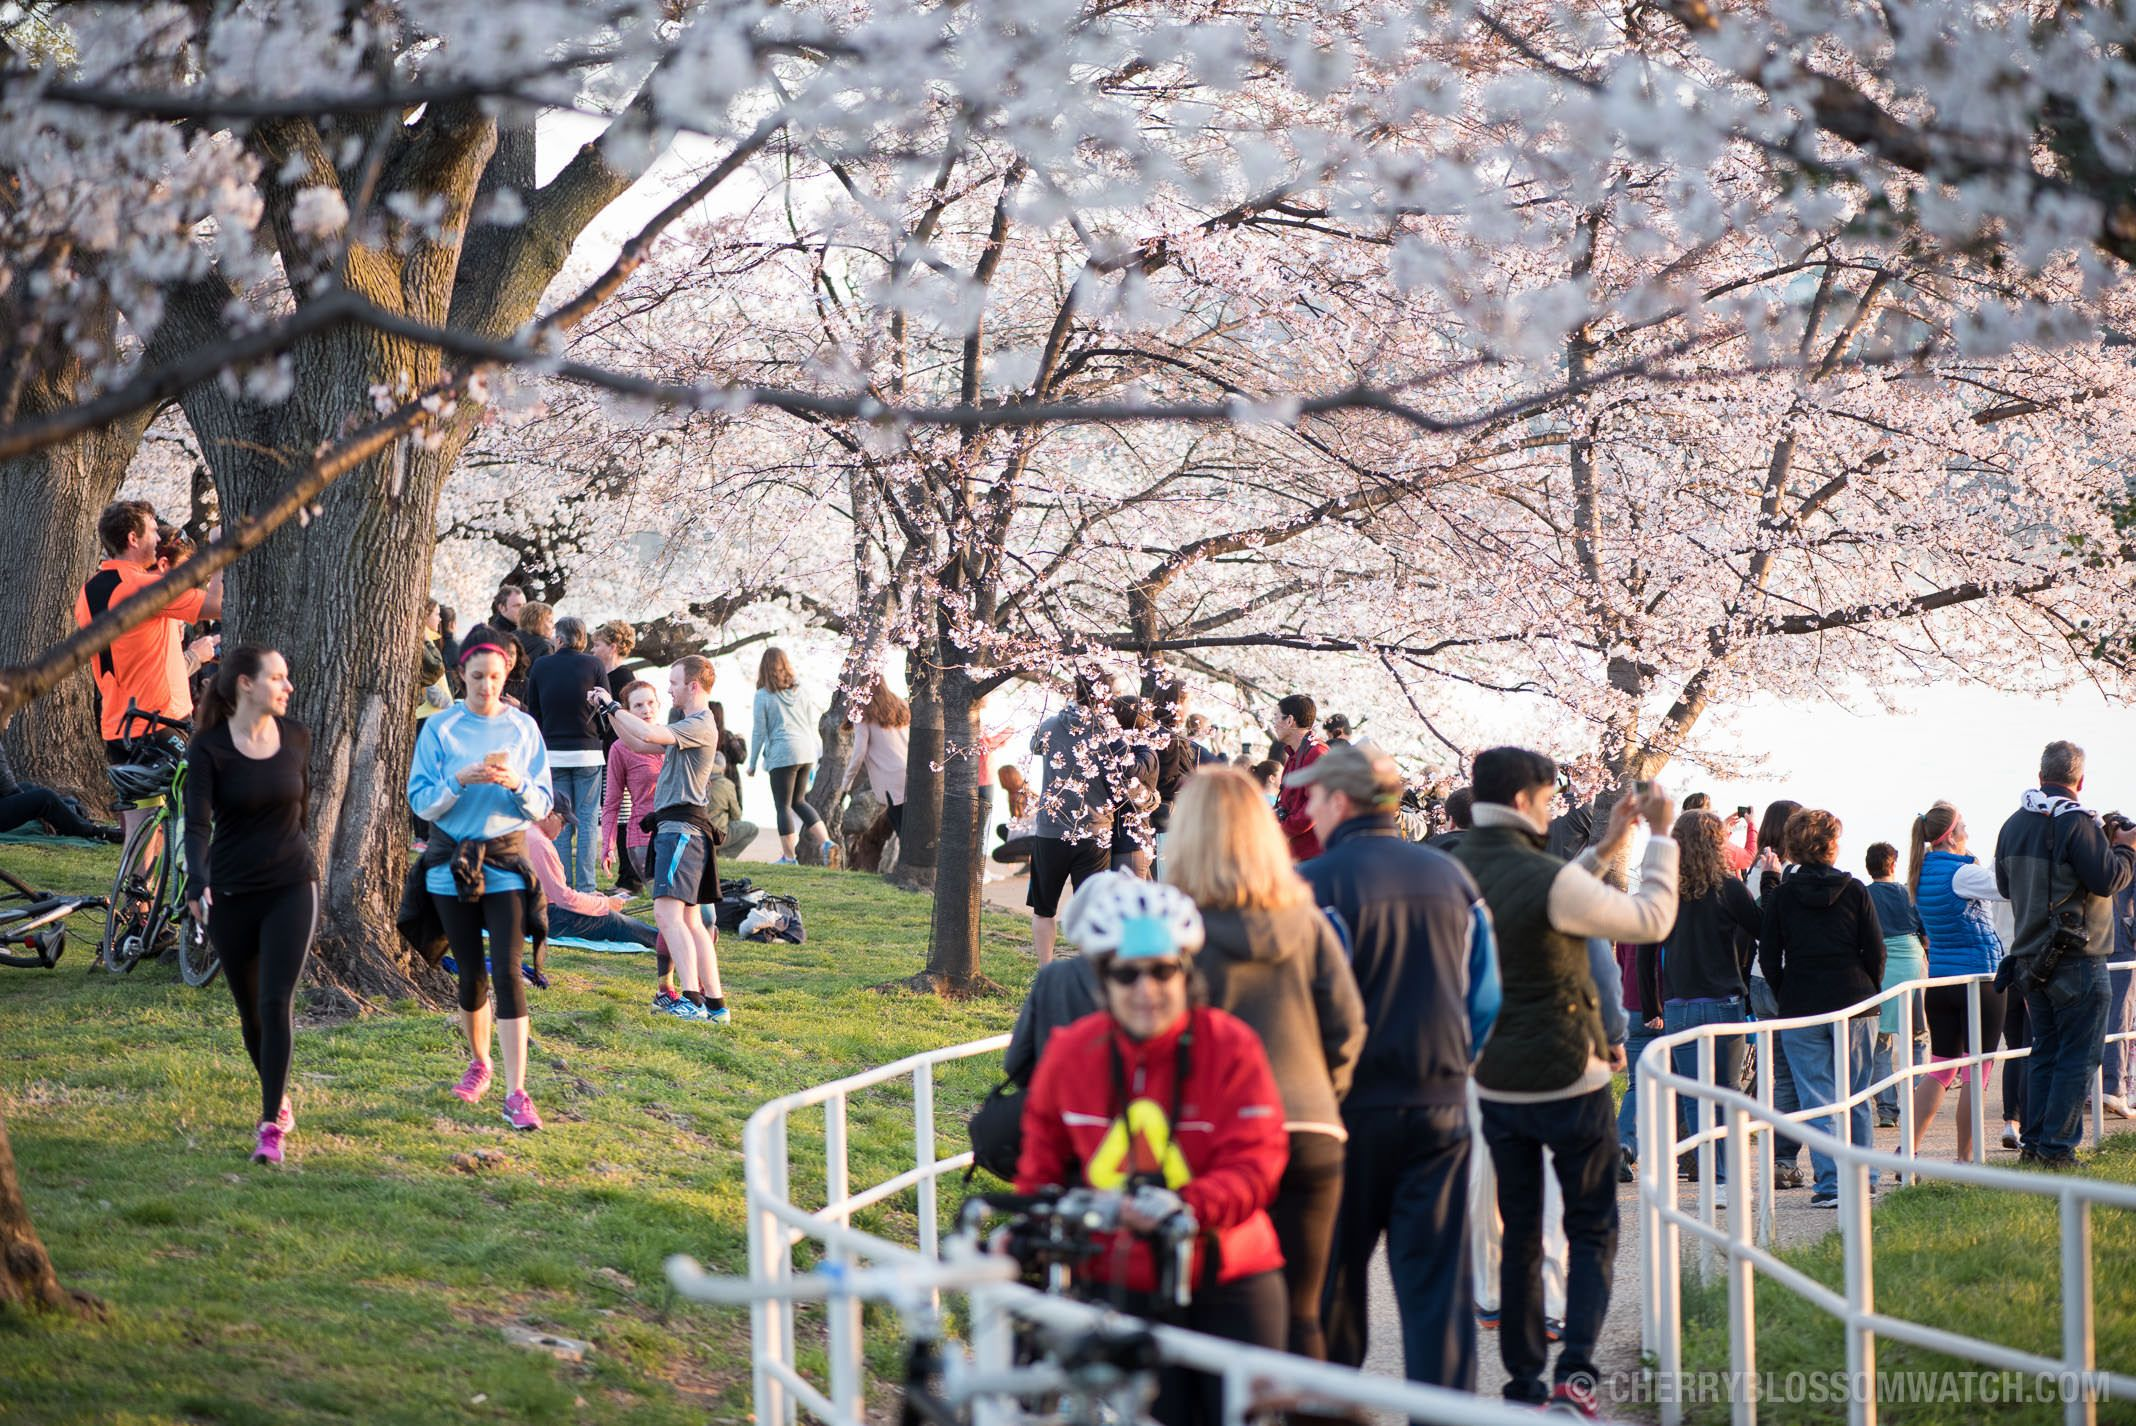 Washington Dc Cherry Blossoms March 24 2016 Cherry Blossom Festival Cherry Blossom Parade Cherry Blossom